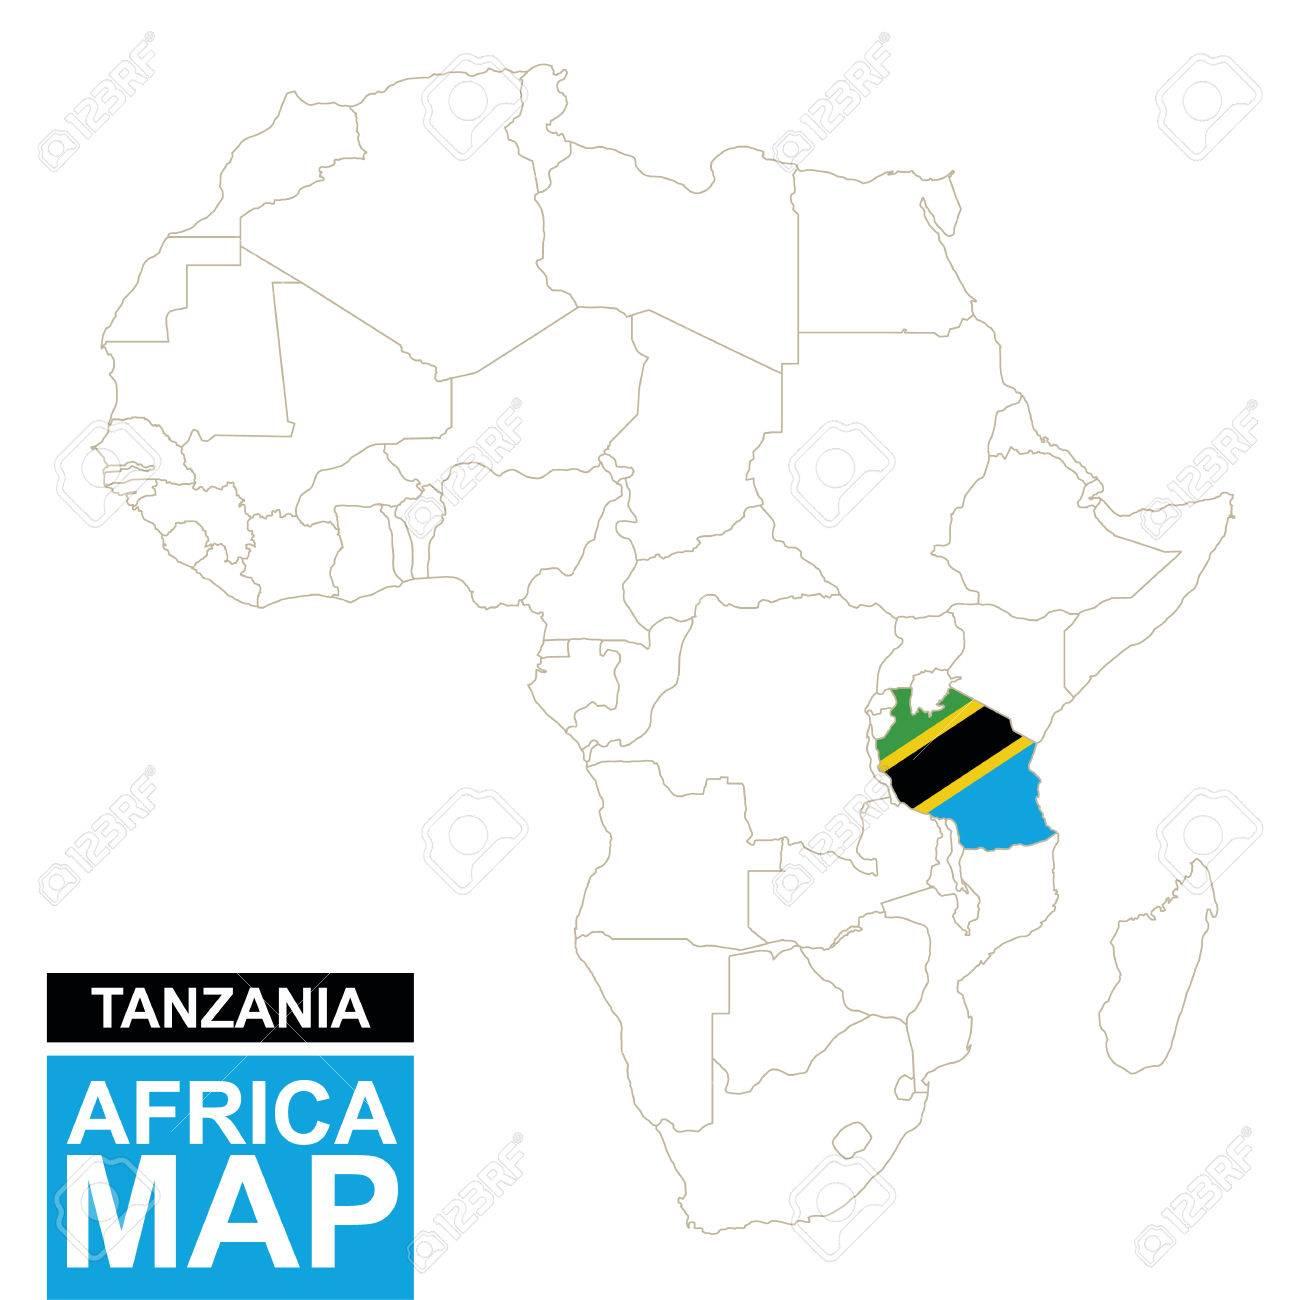 Tanzania On Africa Map.Africa Contoured Map With Highlighted Tanzania Tanzania Map